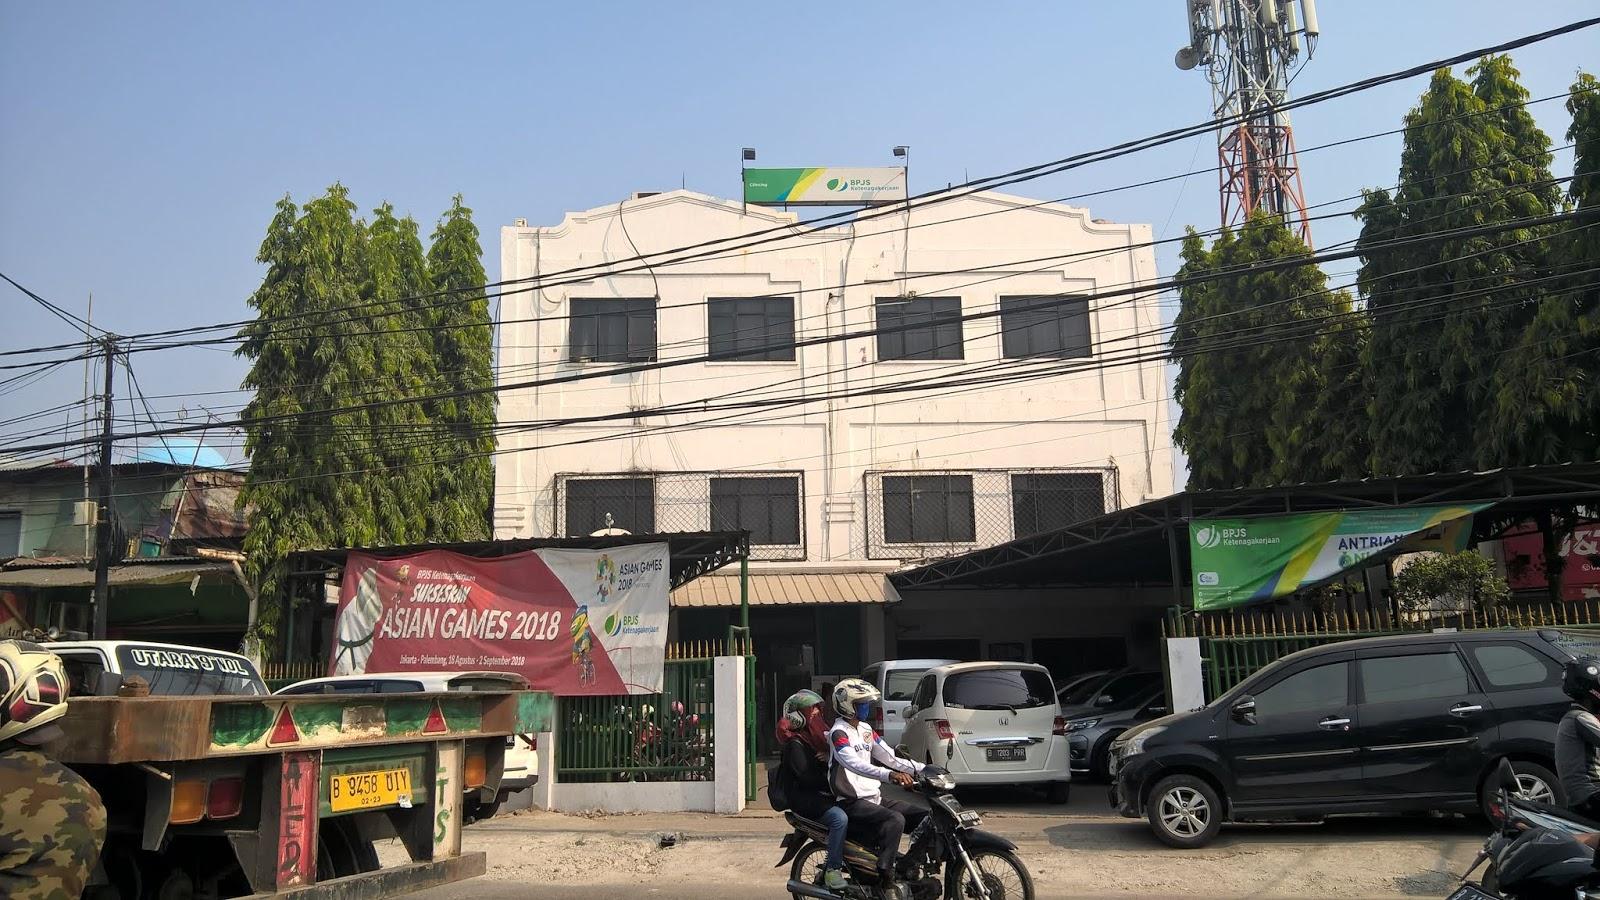 Kantor Bpjs Ketenagakerjaan Cilincing Jakarta Utara Djangkaru Bumi